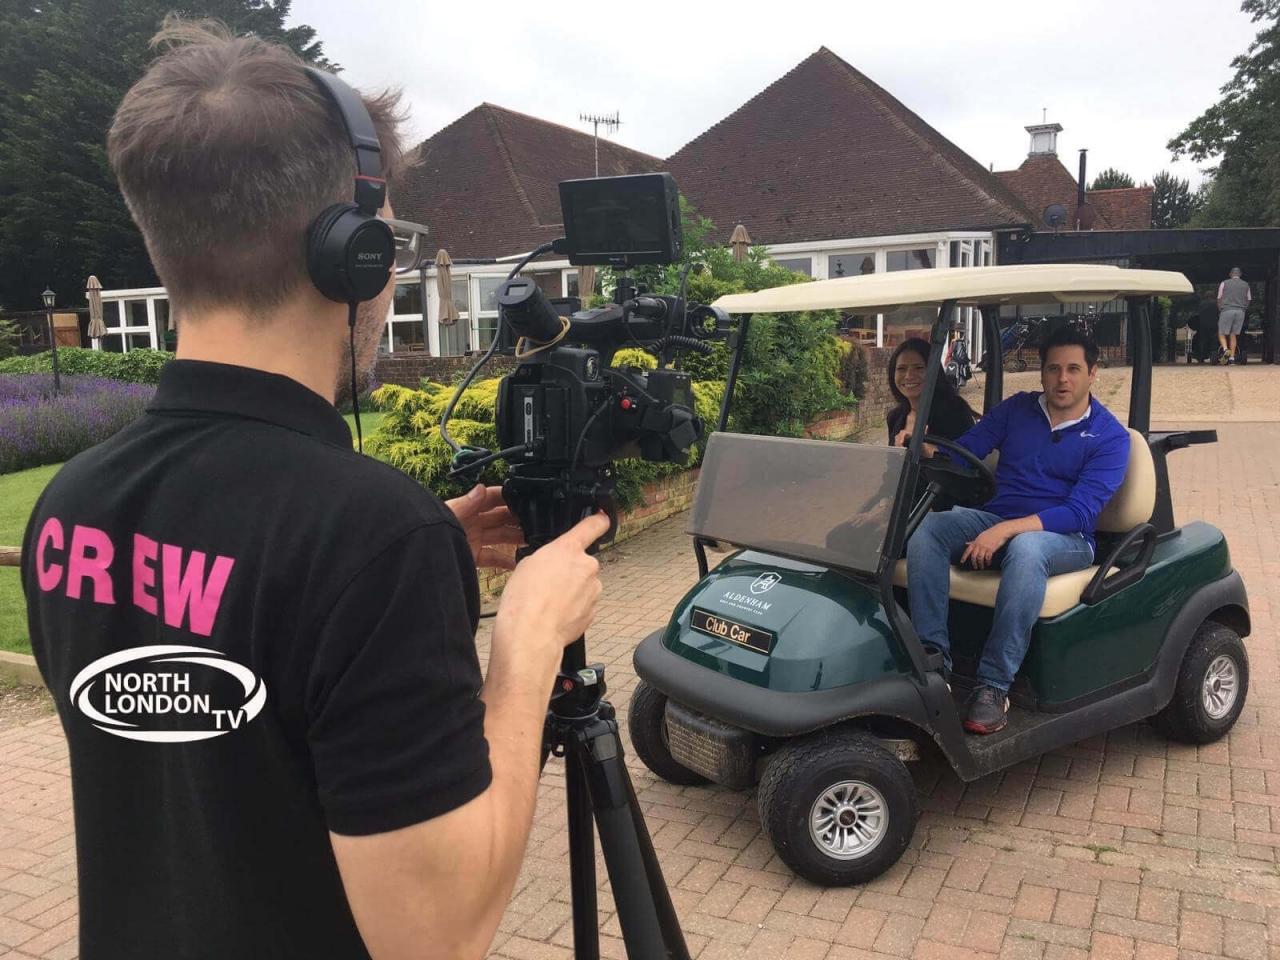 >North London TV: Series 2 Episode 2